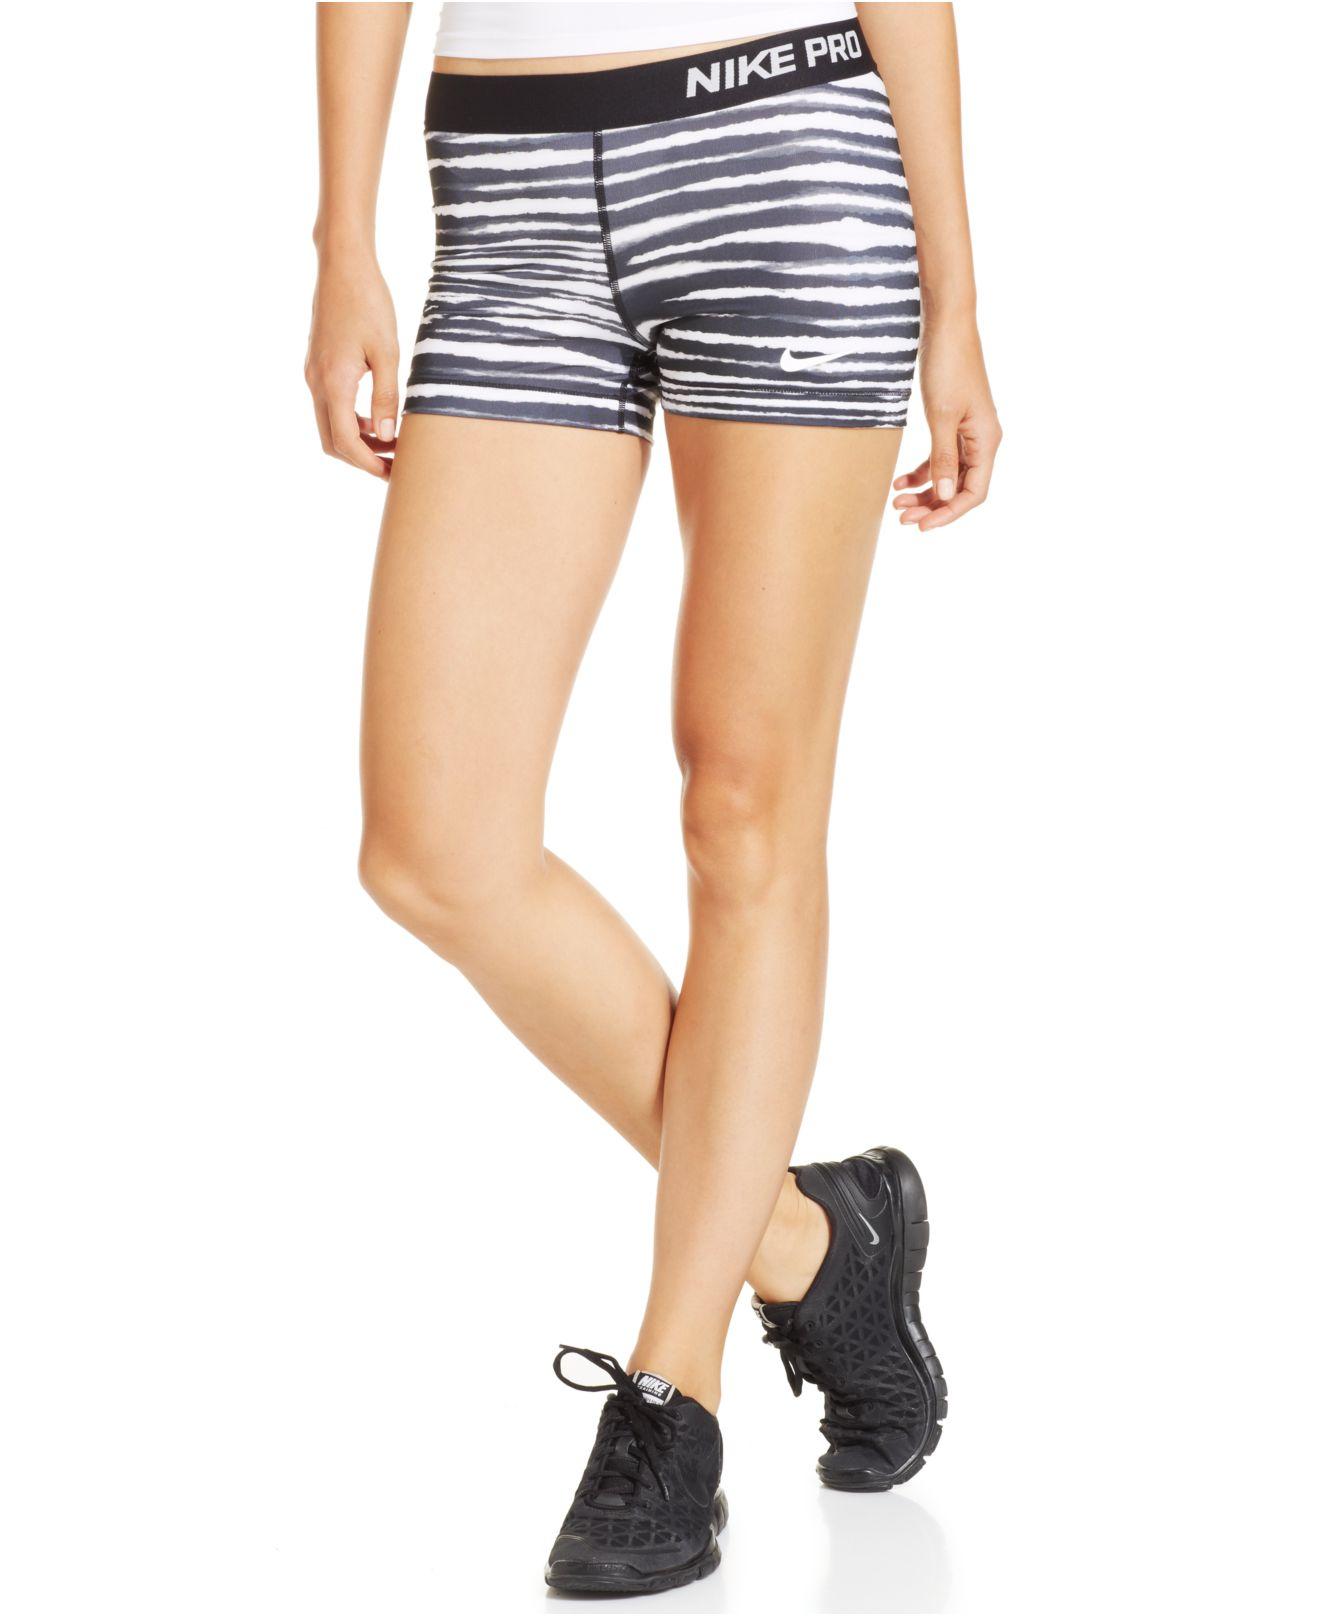 1ed61ab146 Nike Pro Tiger-Stripe Skinny Dri-Fit Shorts in Black - Lyst